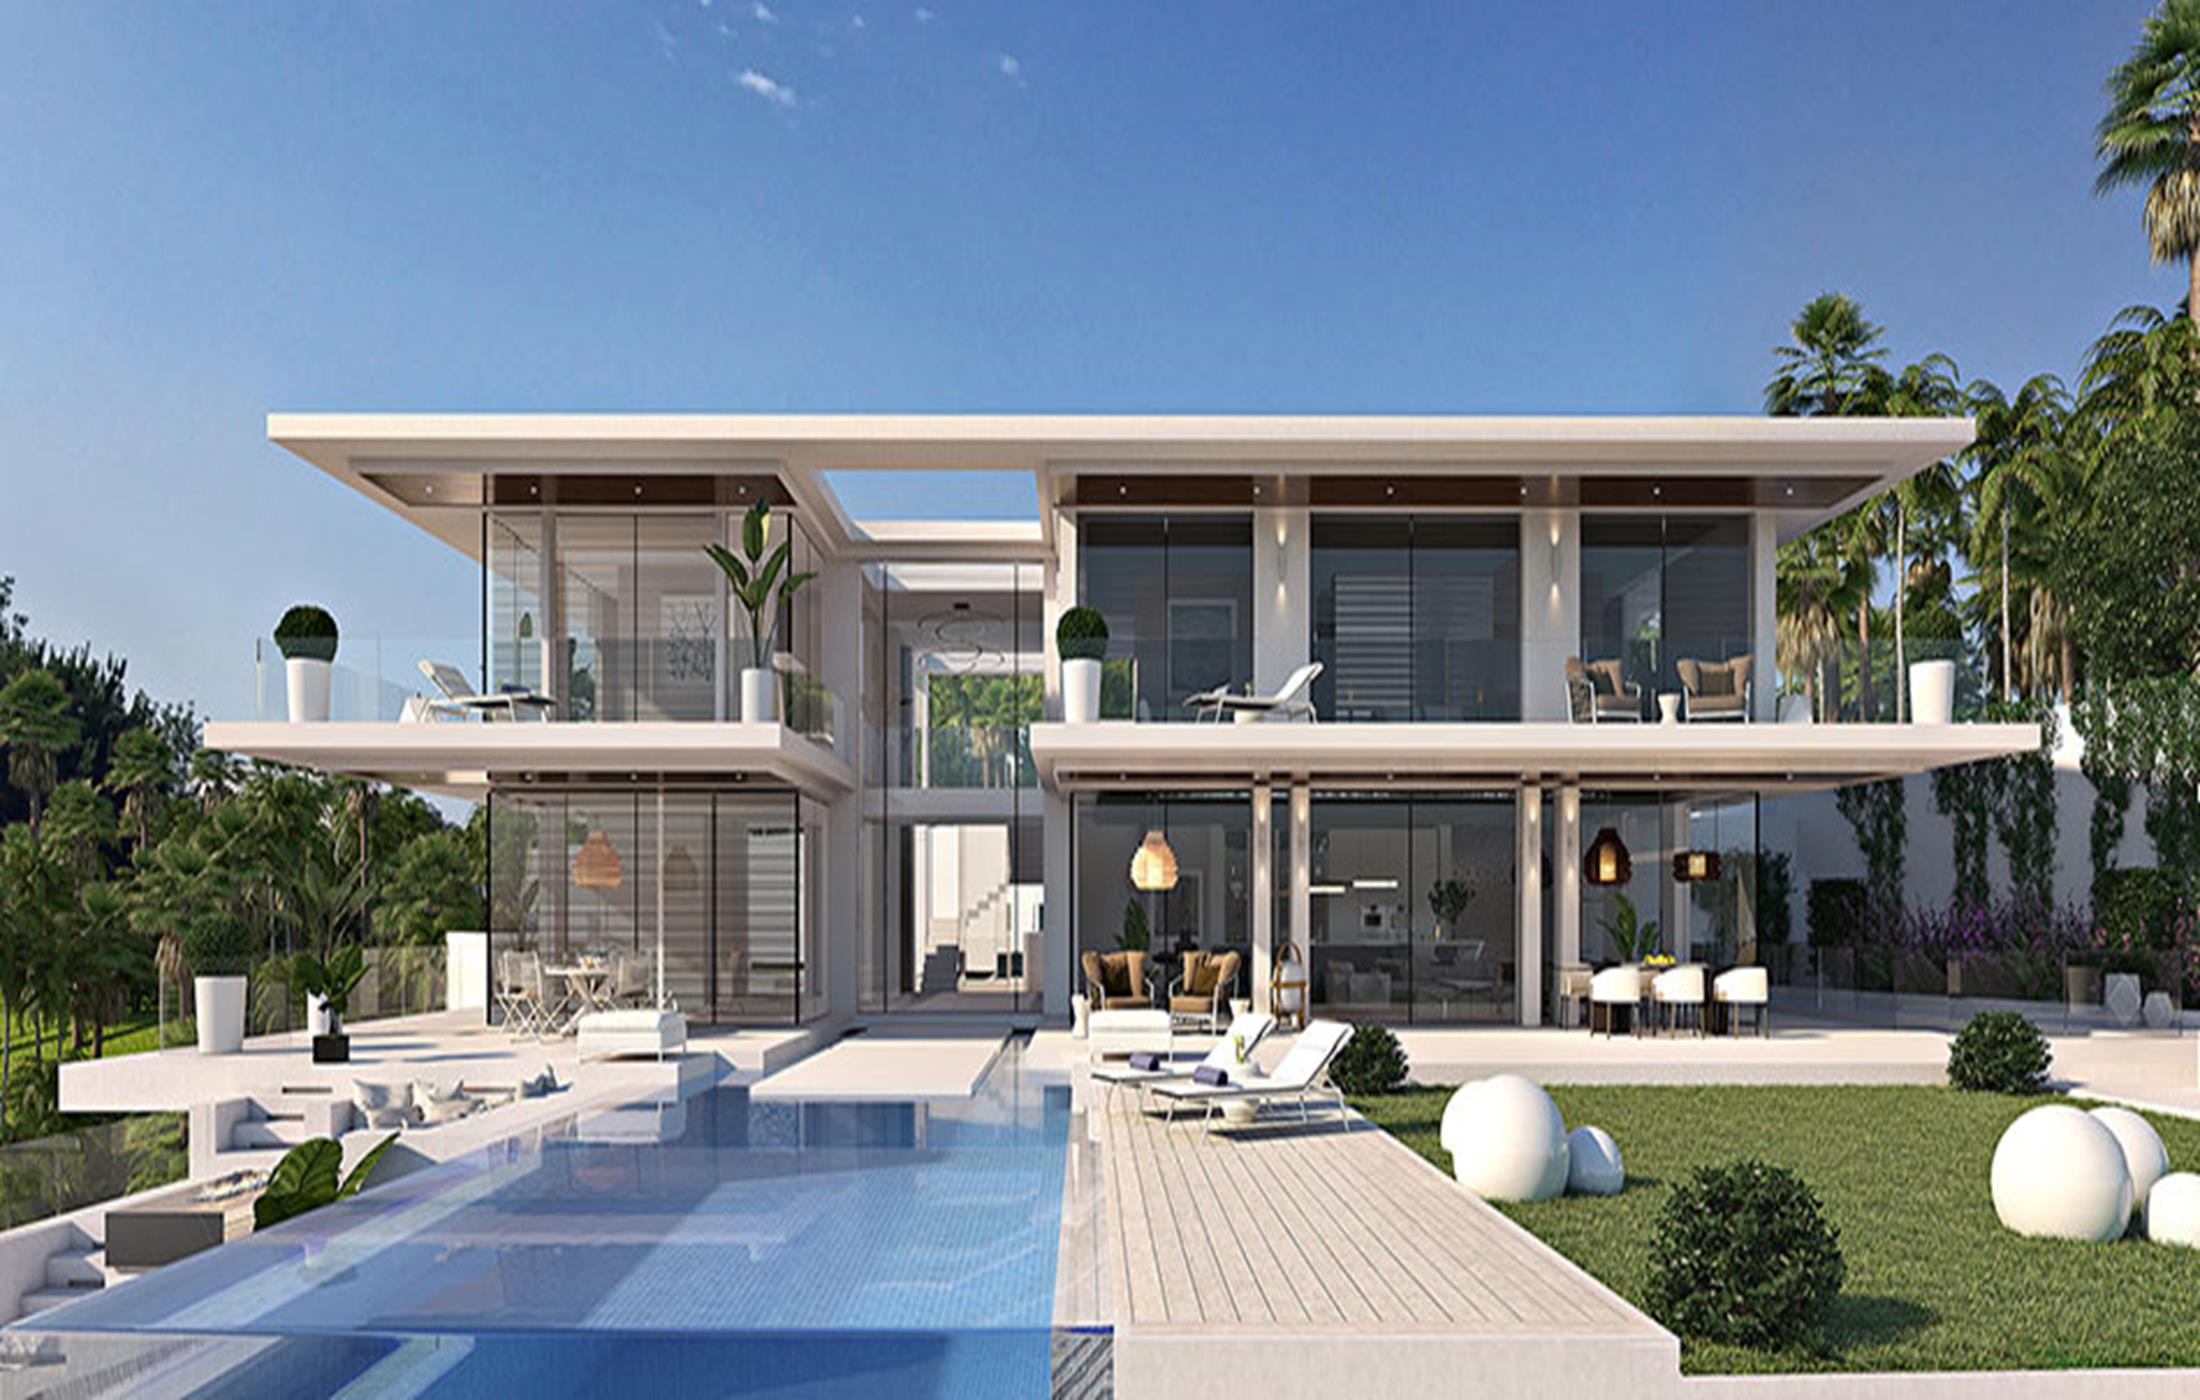 Villa moderna de estilo Californiano en Benahavis